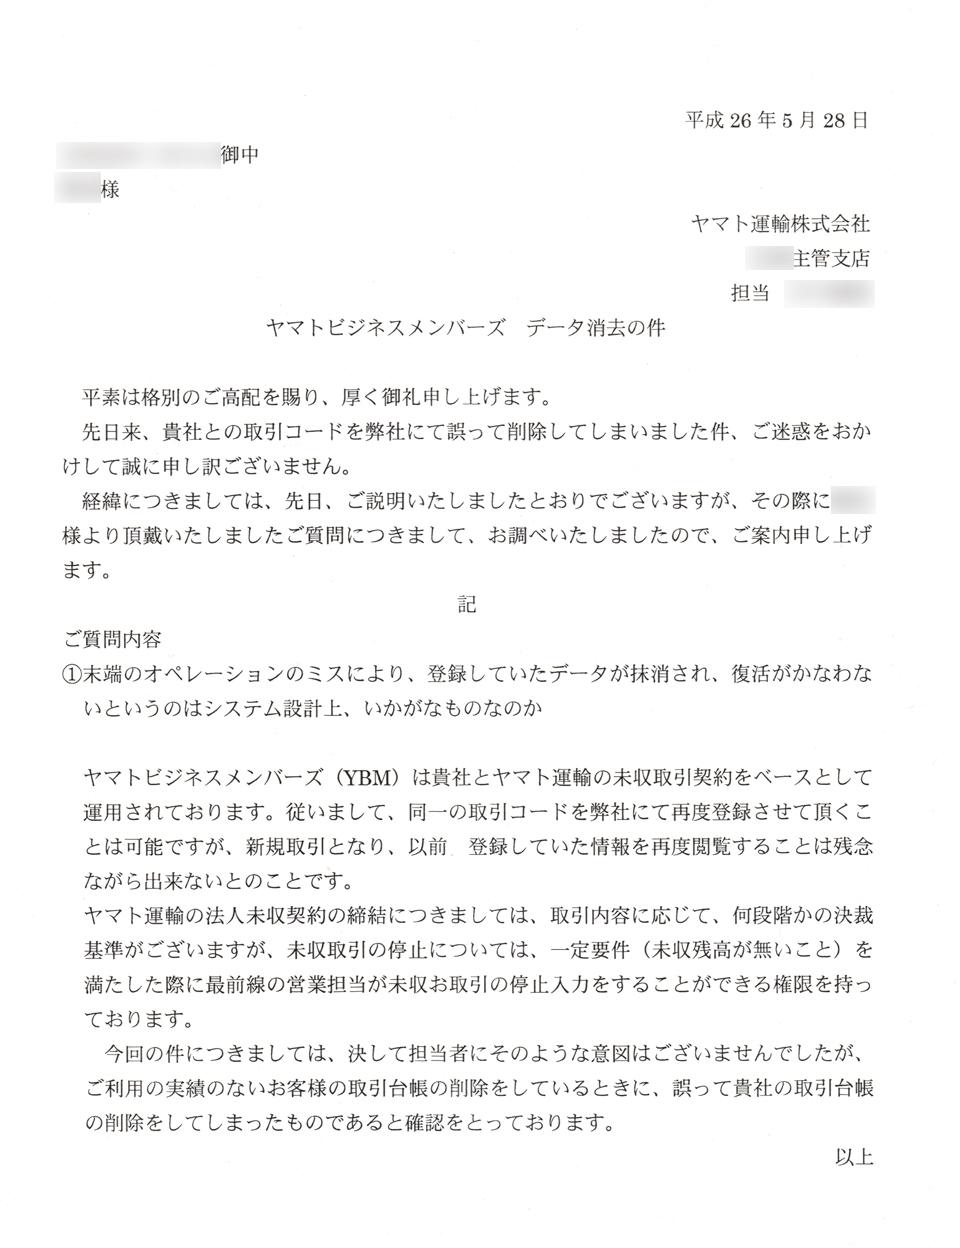 KuronekoSetsumei-20140529